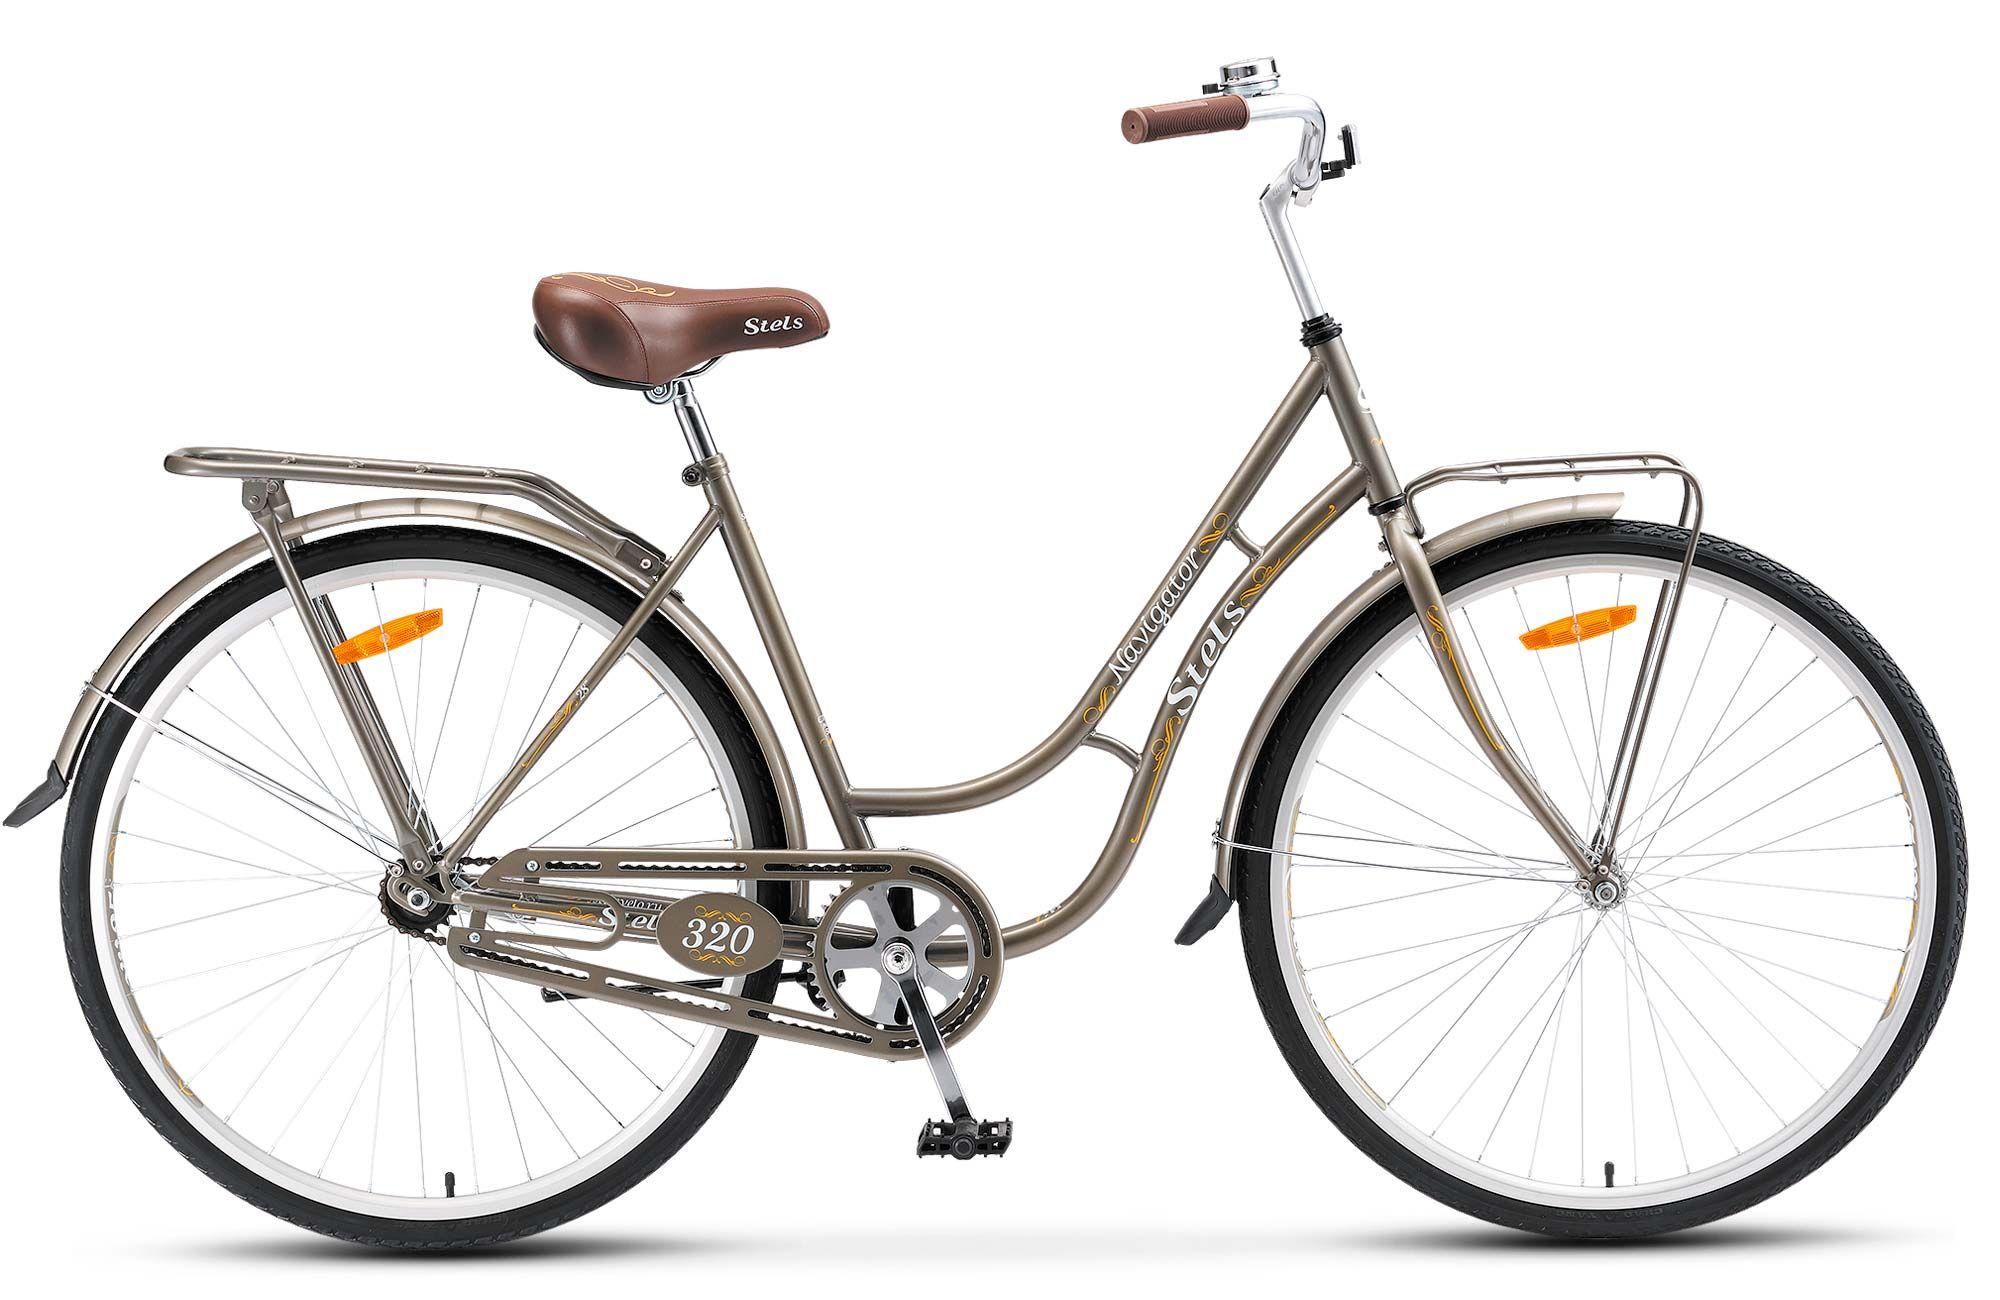 Велосипед Stels Navigator 320 2017 велосипед stels miss 8900 md 2015